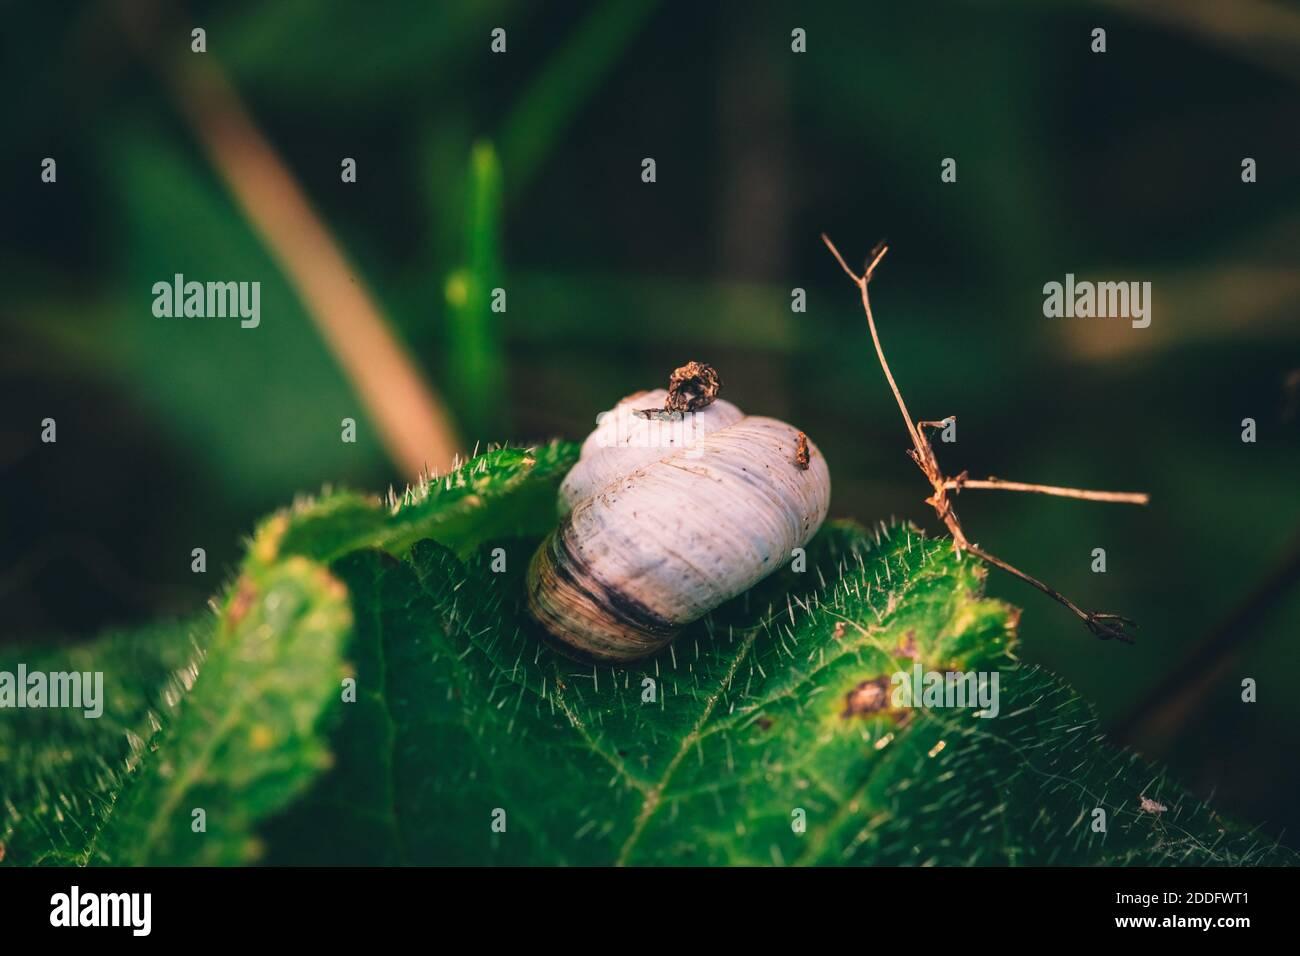 A macro image of a shrub snail or Genus Praticolella on a leaf close up Stock Photo